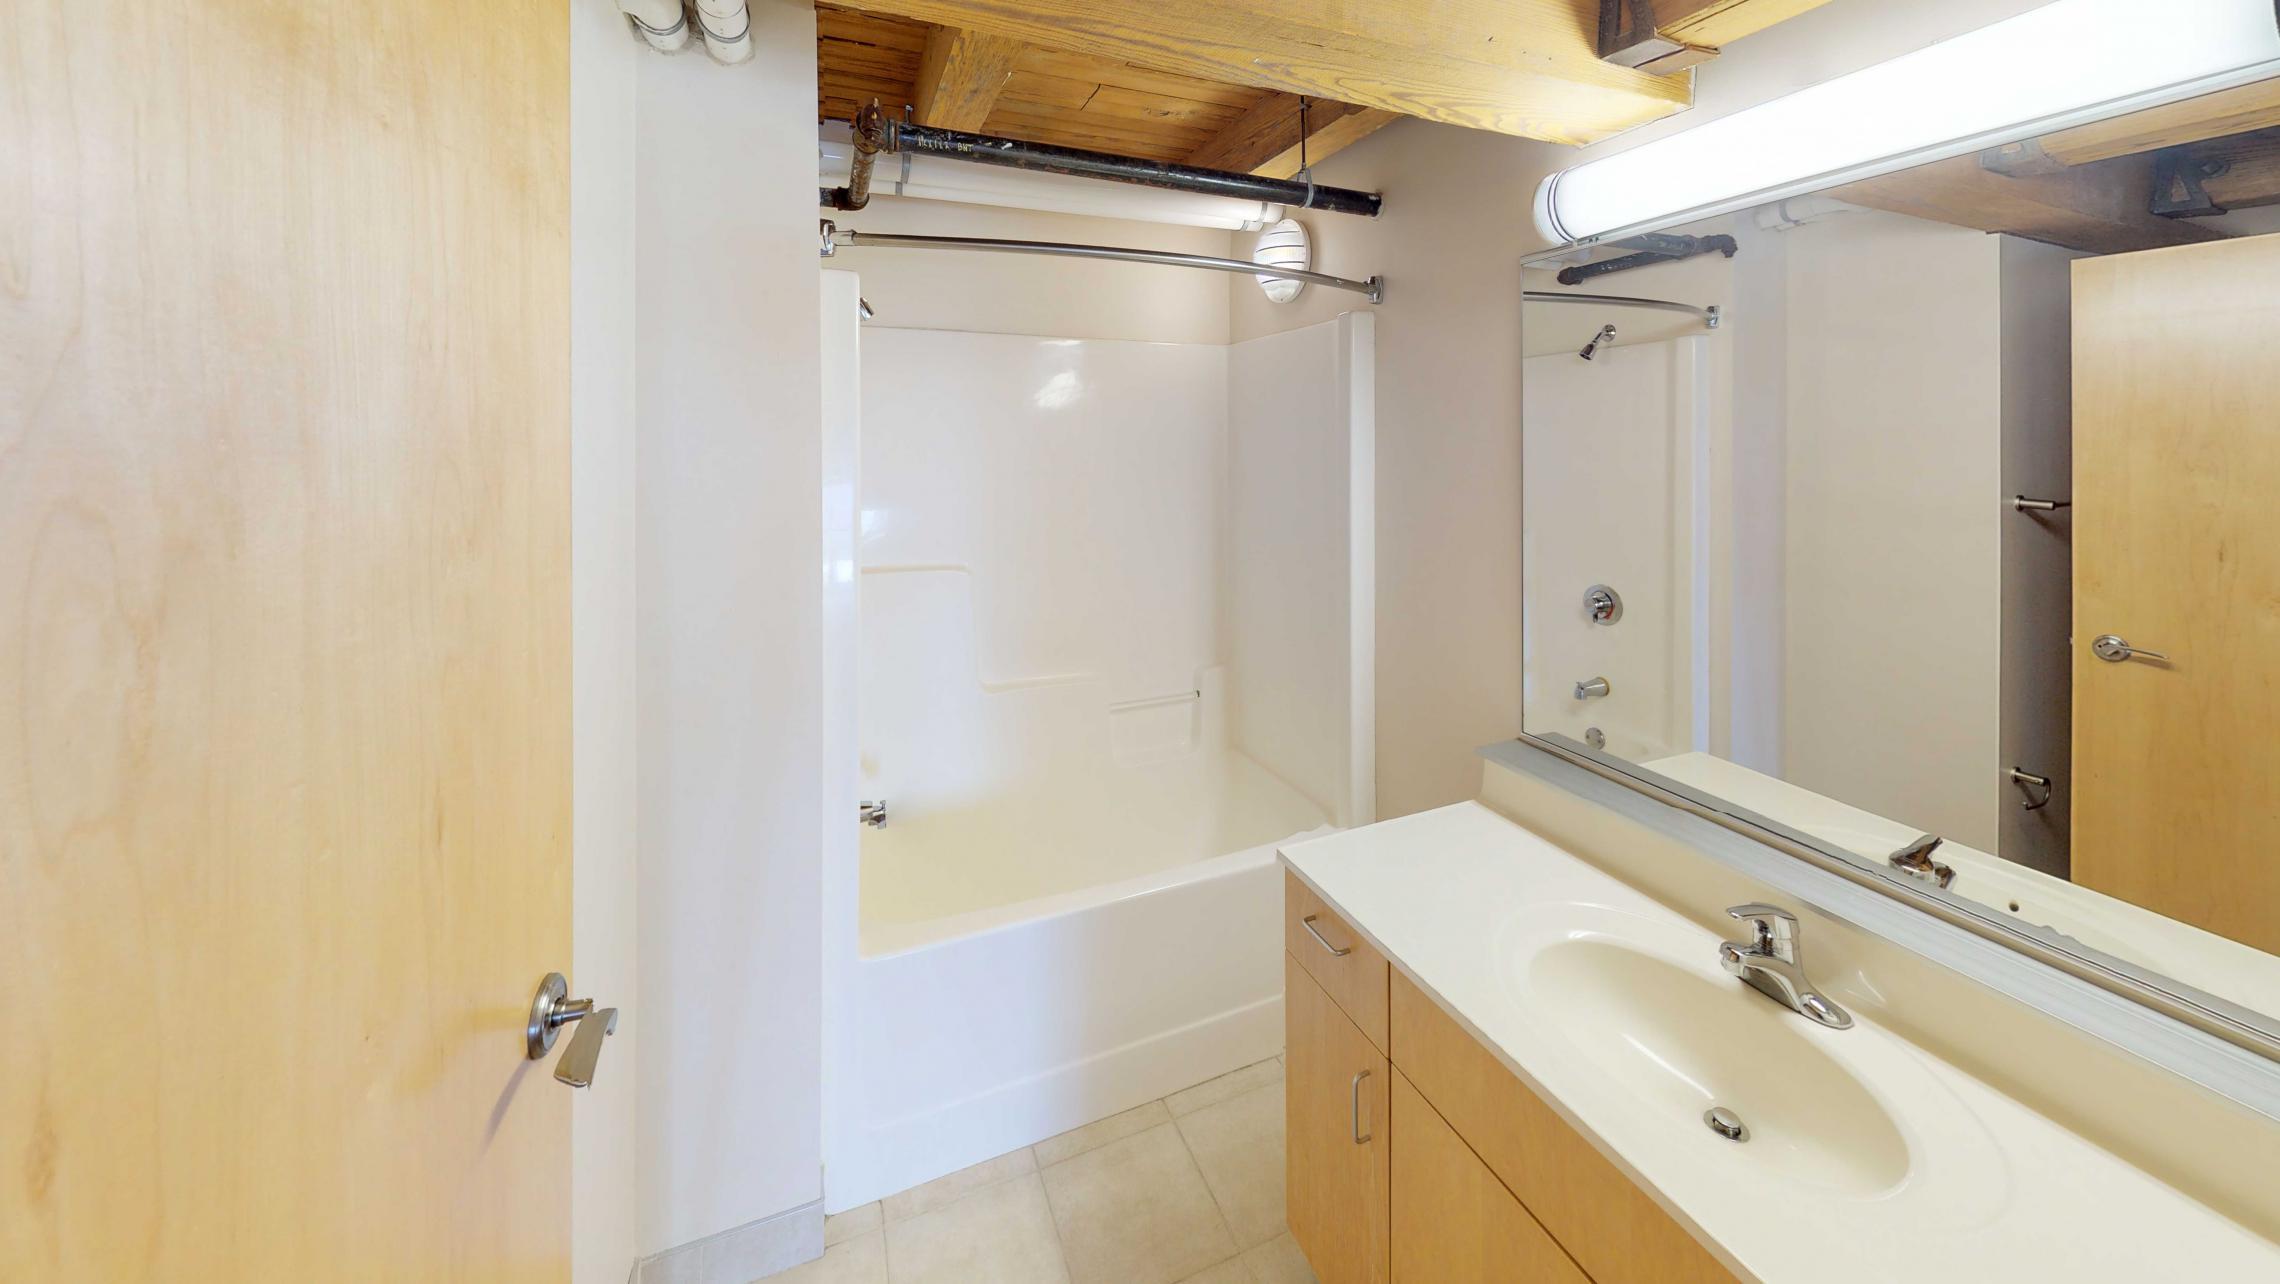 Tobacco-Lofts-E203-Bathroom-Lofted-Two-bedroom-downtown-madison-balcony-view-design.jpg